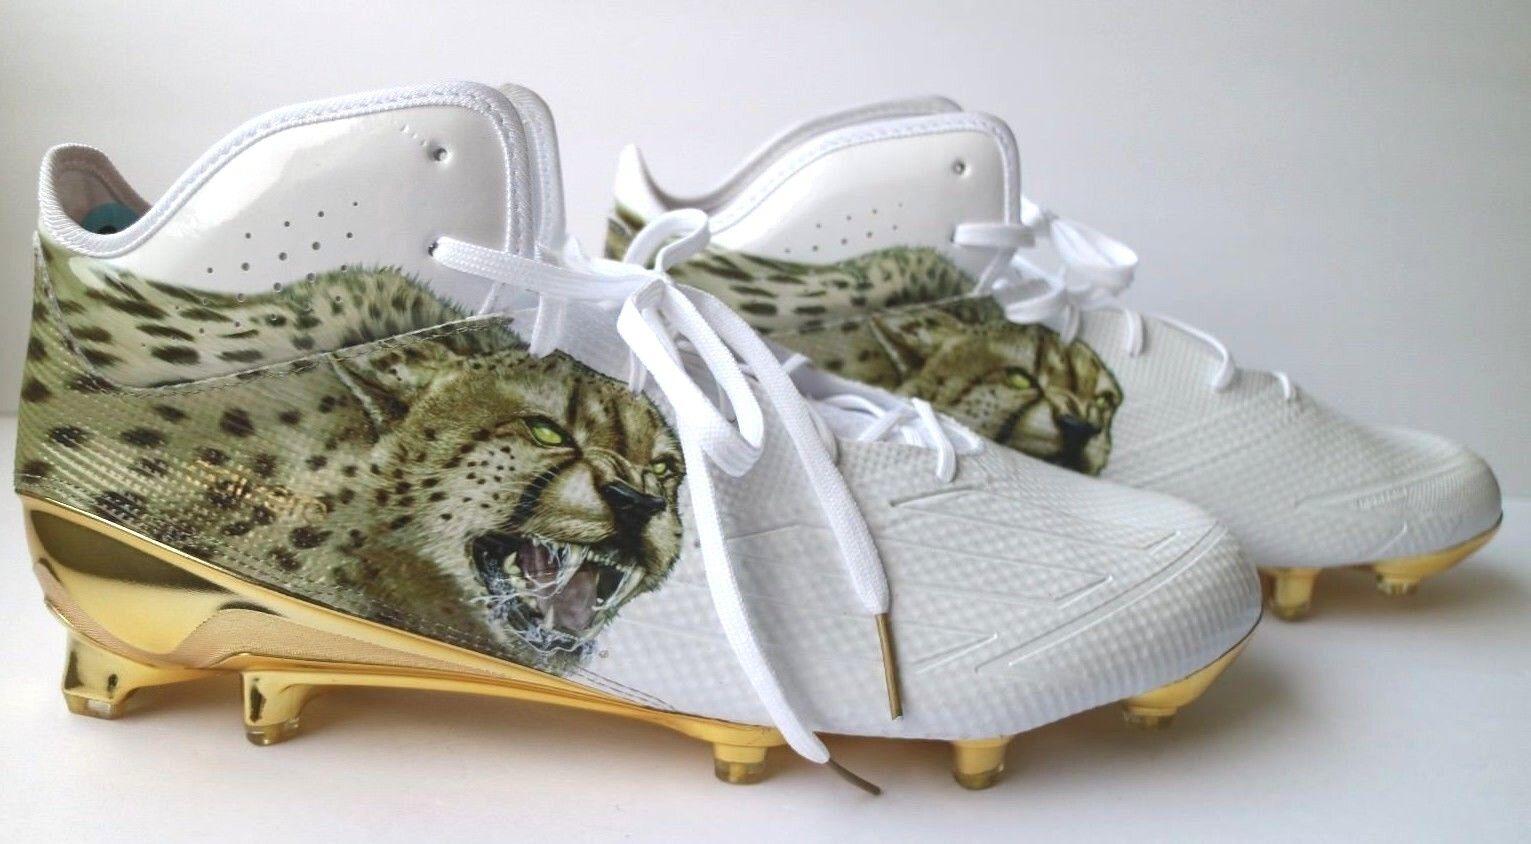 Adidas Adizero 5 Star 5.0 Uncaged Football Cleats Mens 16 Cheetah gold AQ7817